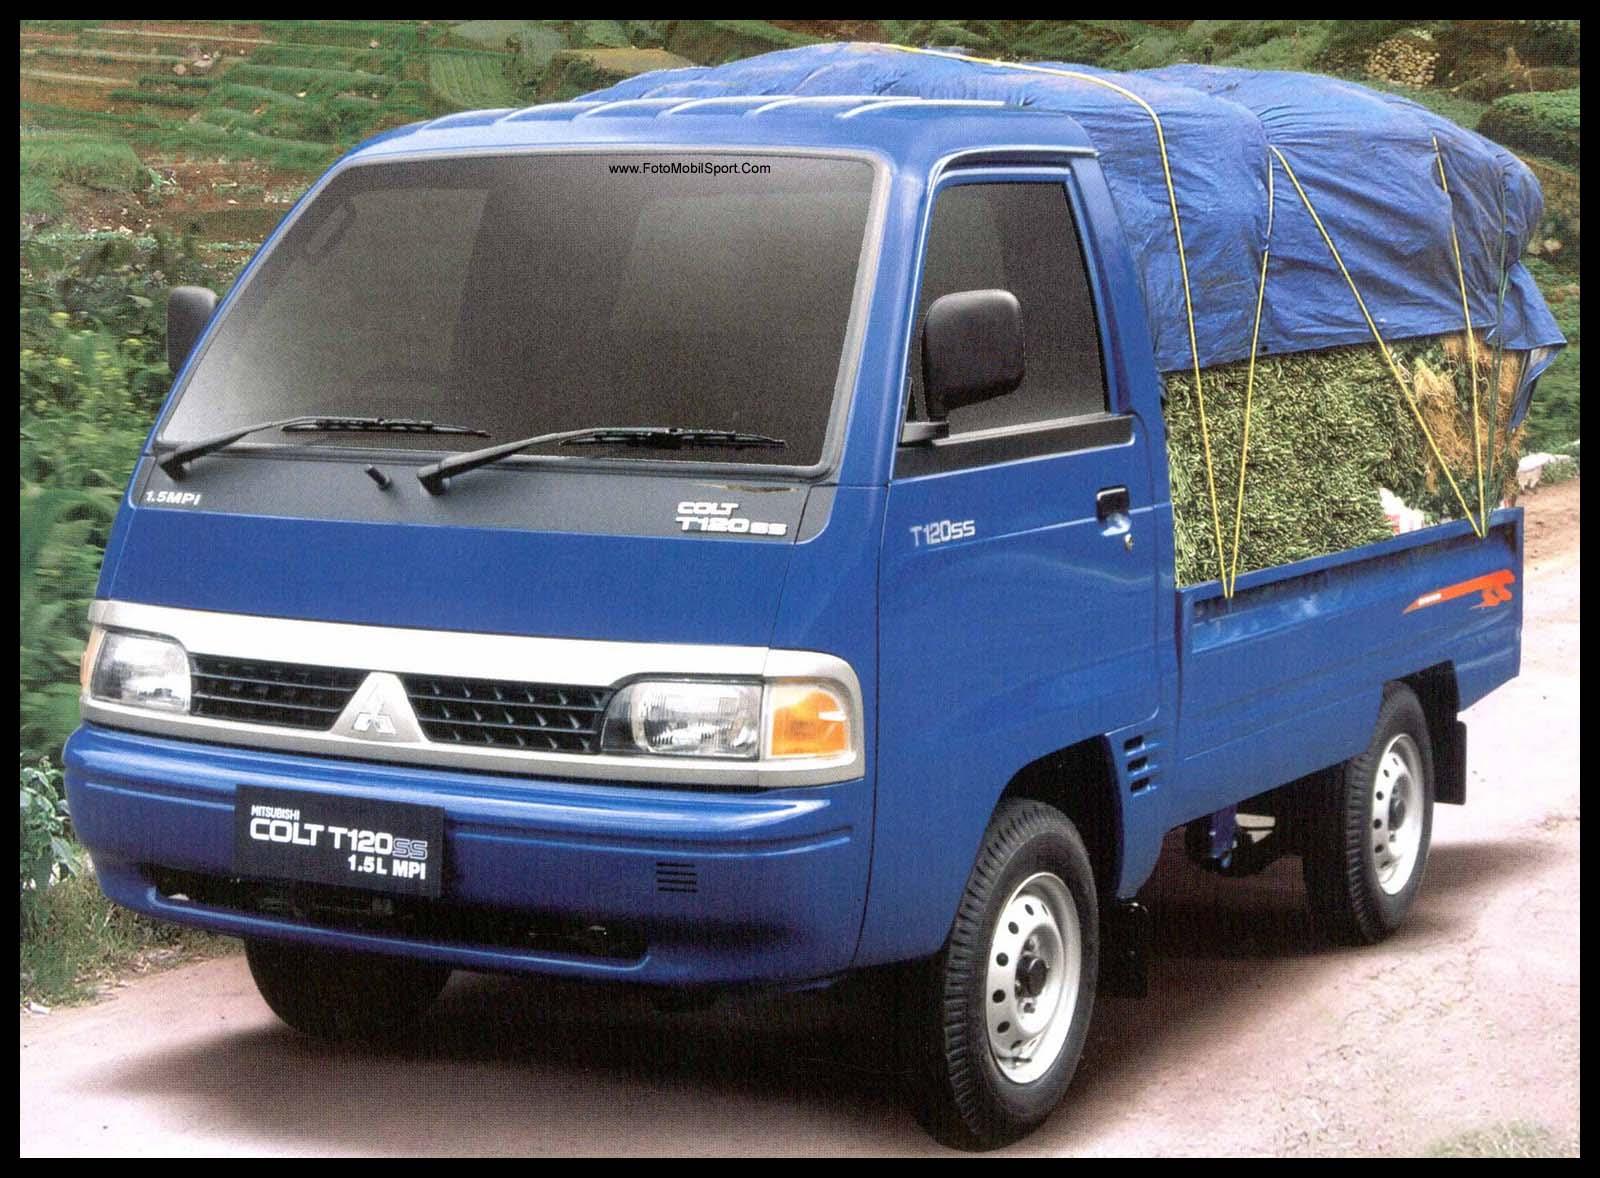 Foto Modifikasi Mobil L300 Pick Up | Modifotto